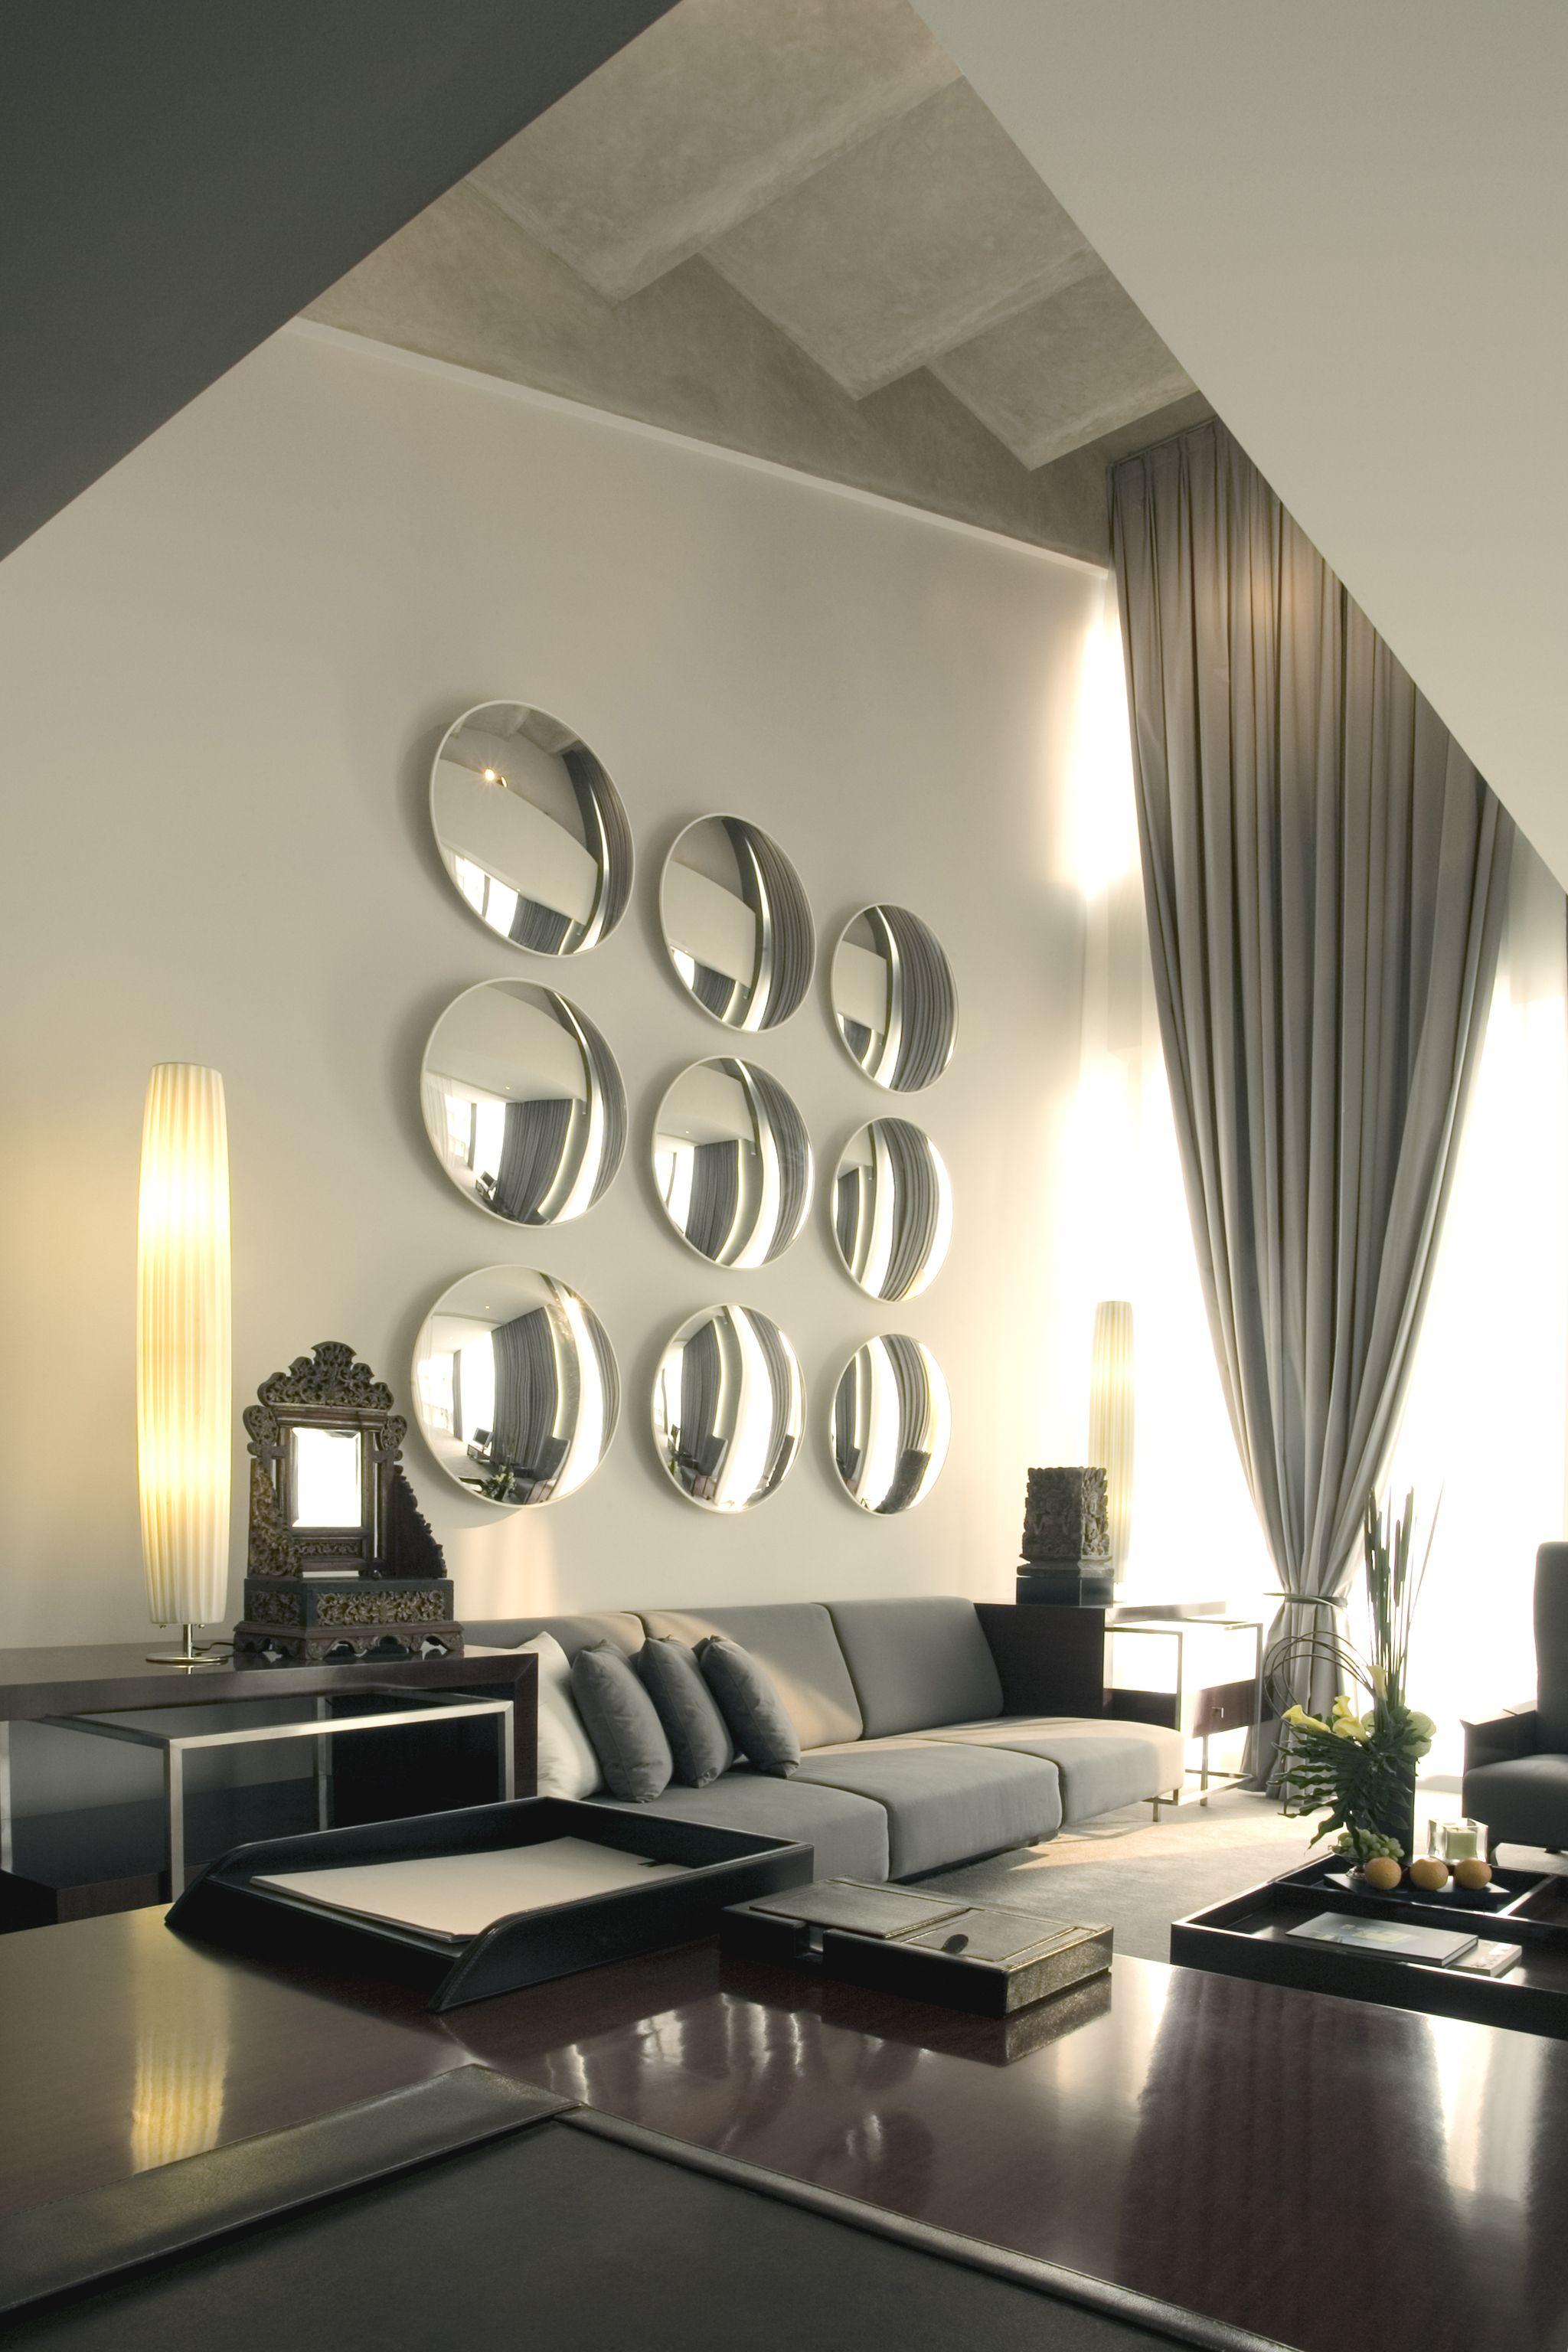 Mirrors wall mirror decorative accents decorating floor mirror